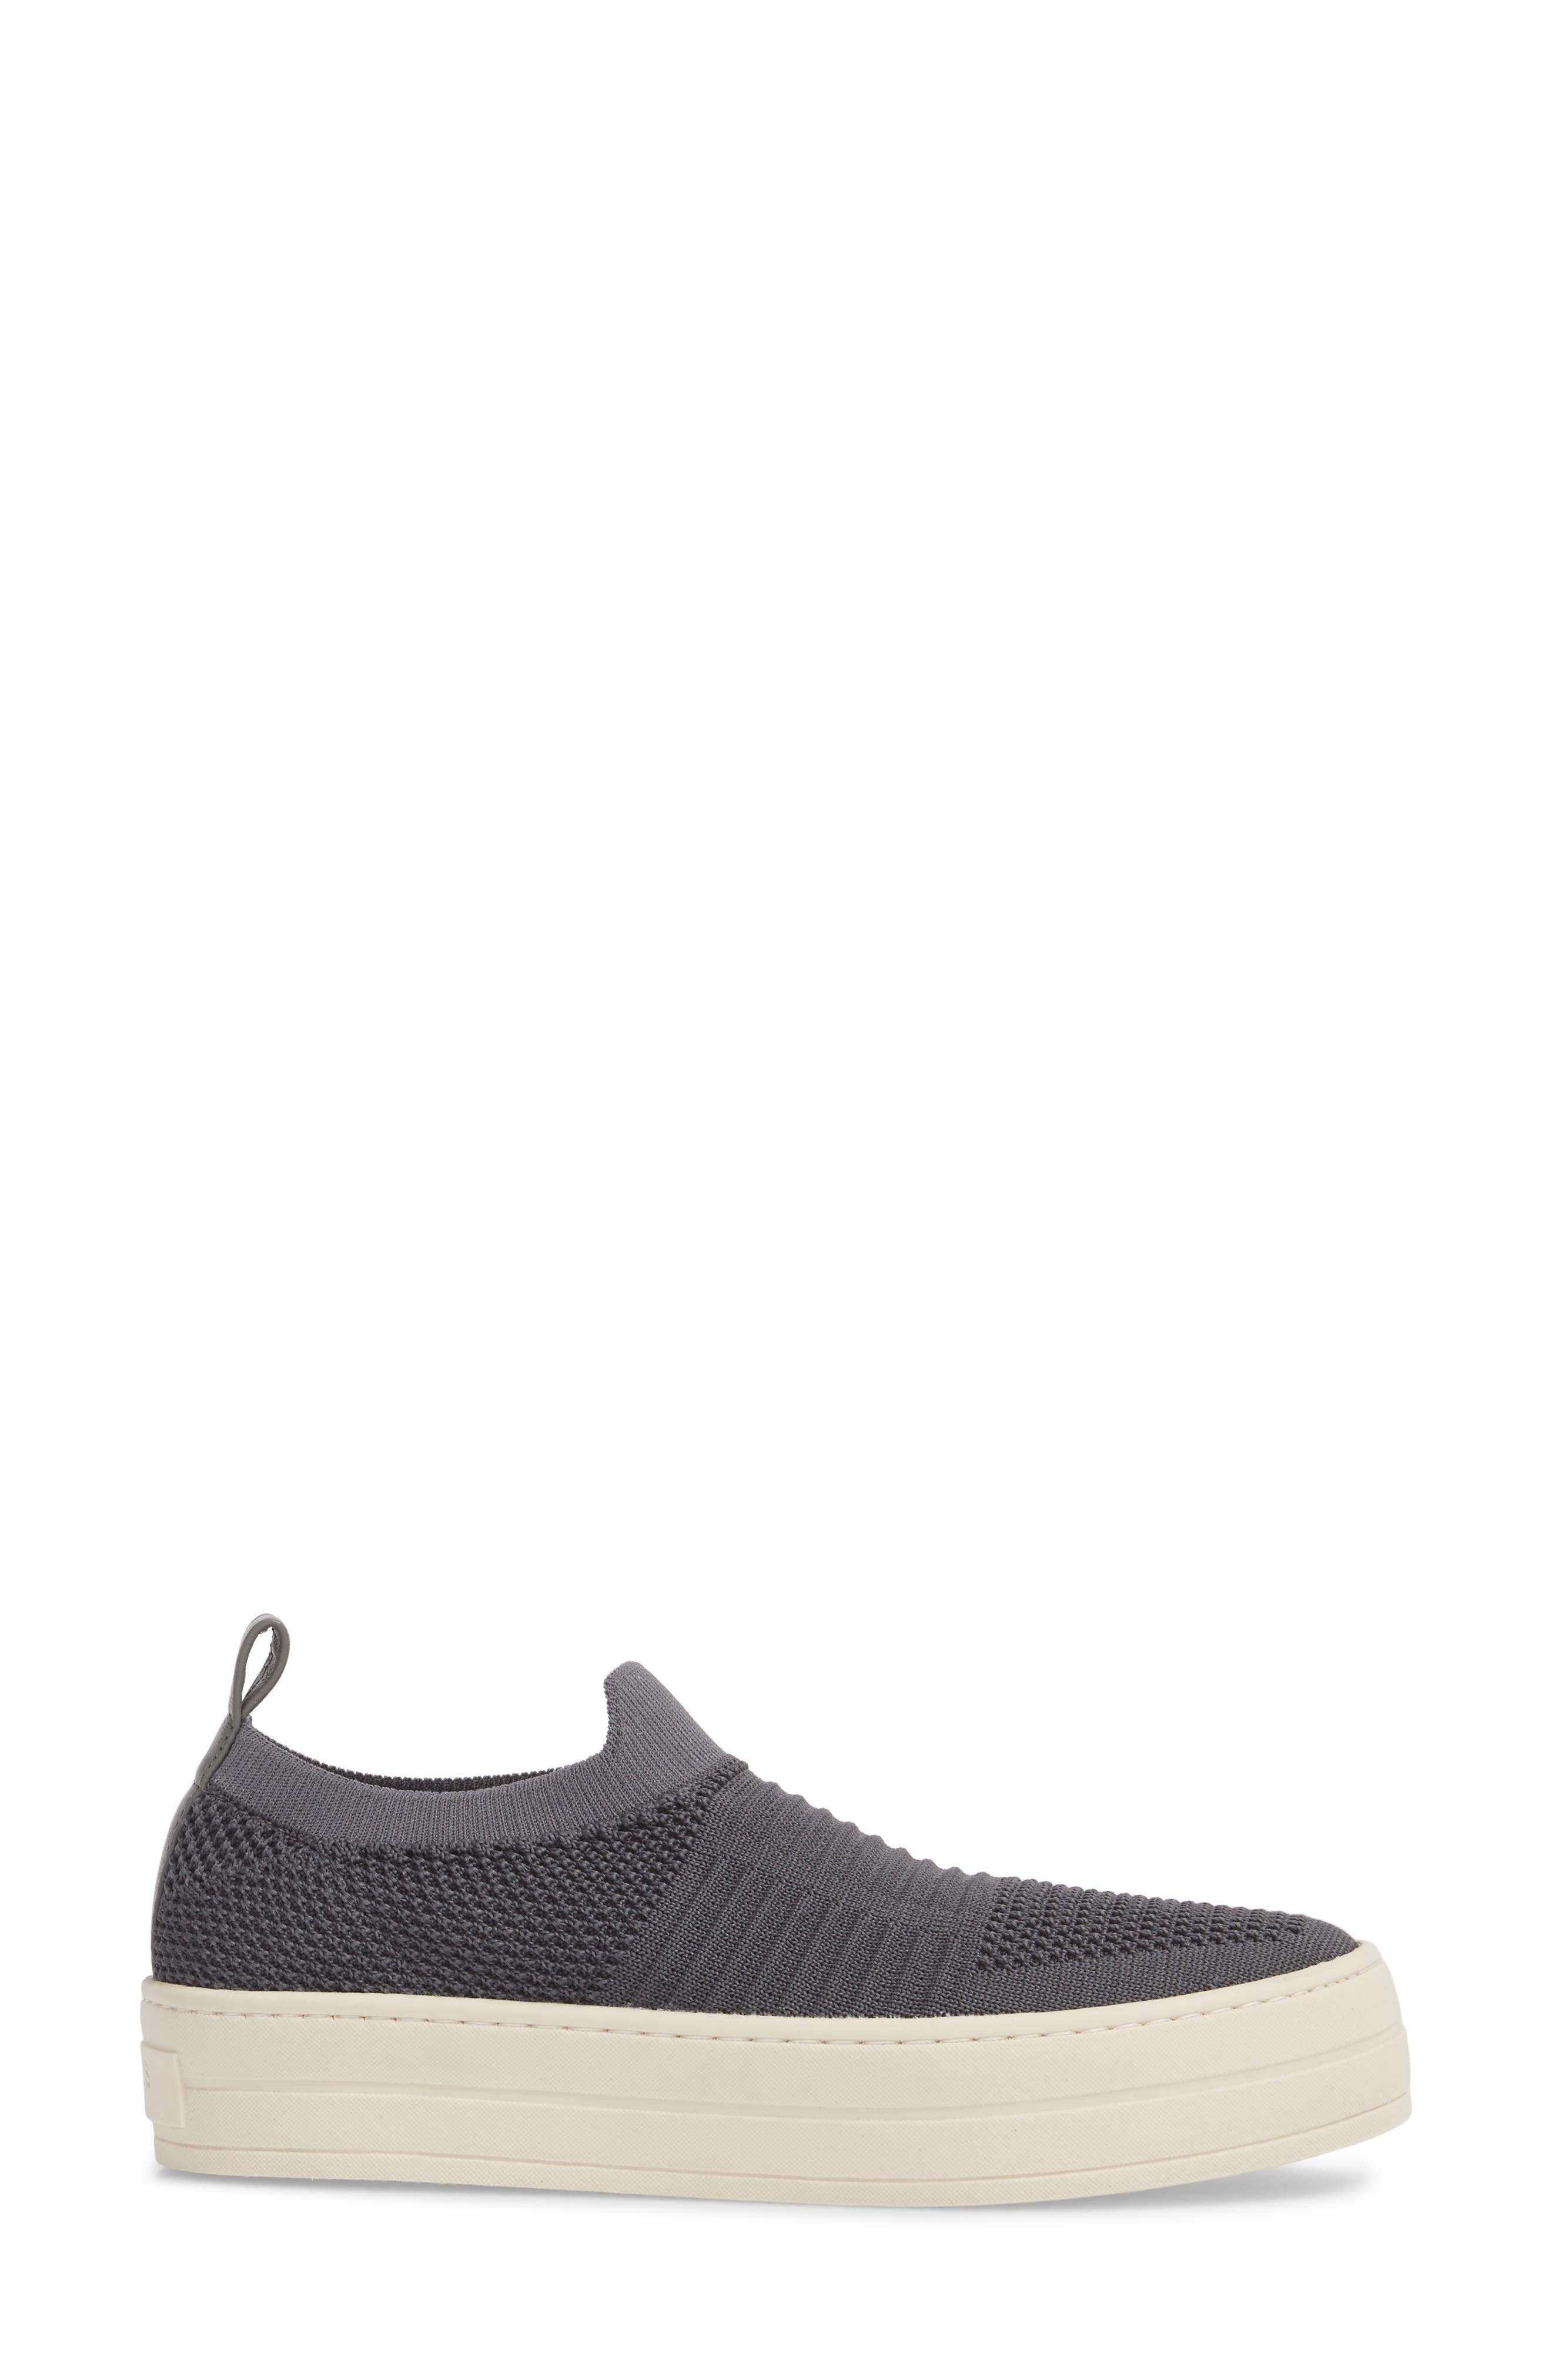 Hilo Platform Slip-On Sneaker,                             Alternate thumbnail 3, color,                             Grey Fabric